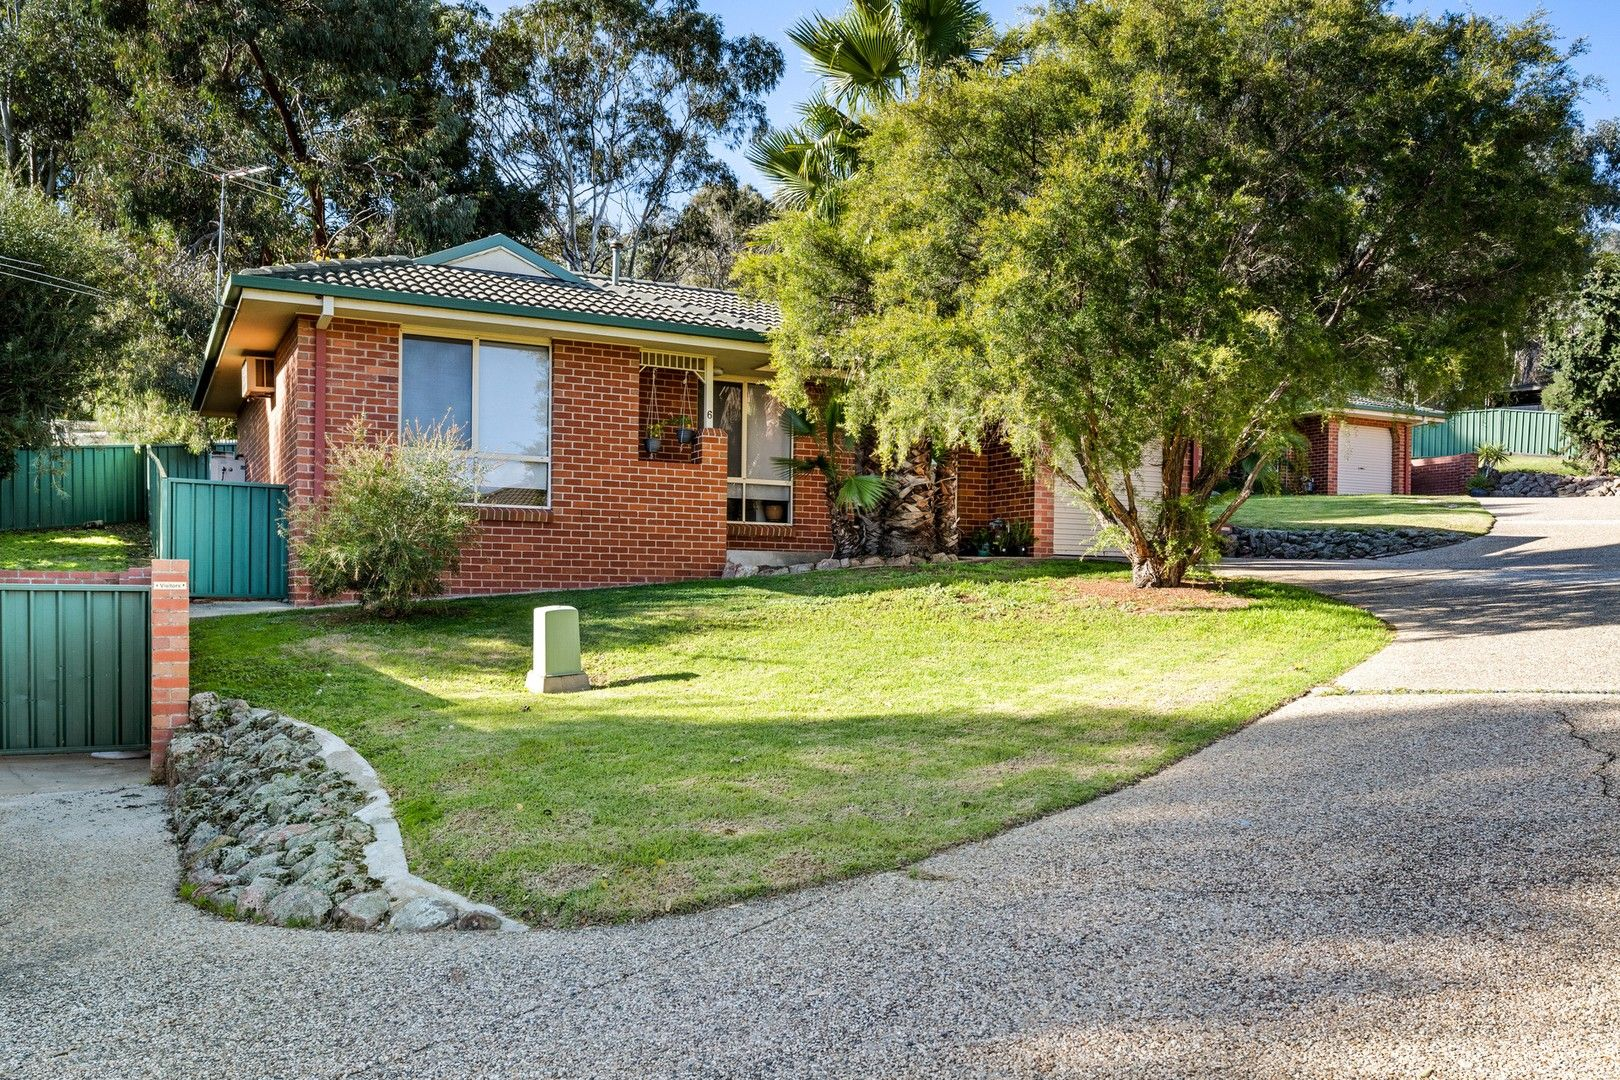 6/498 Thorold Street, West Albury NSW 2640, Image 0